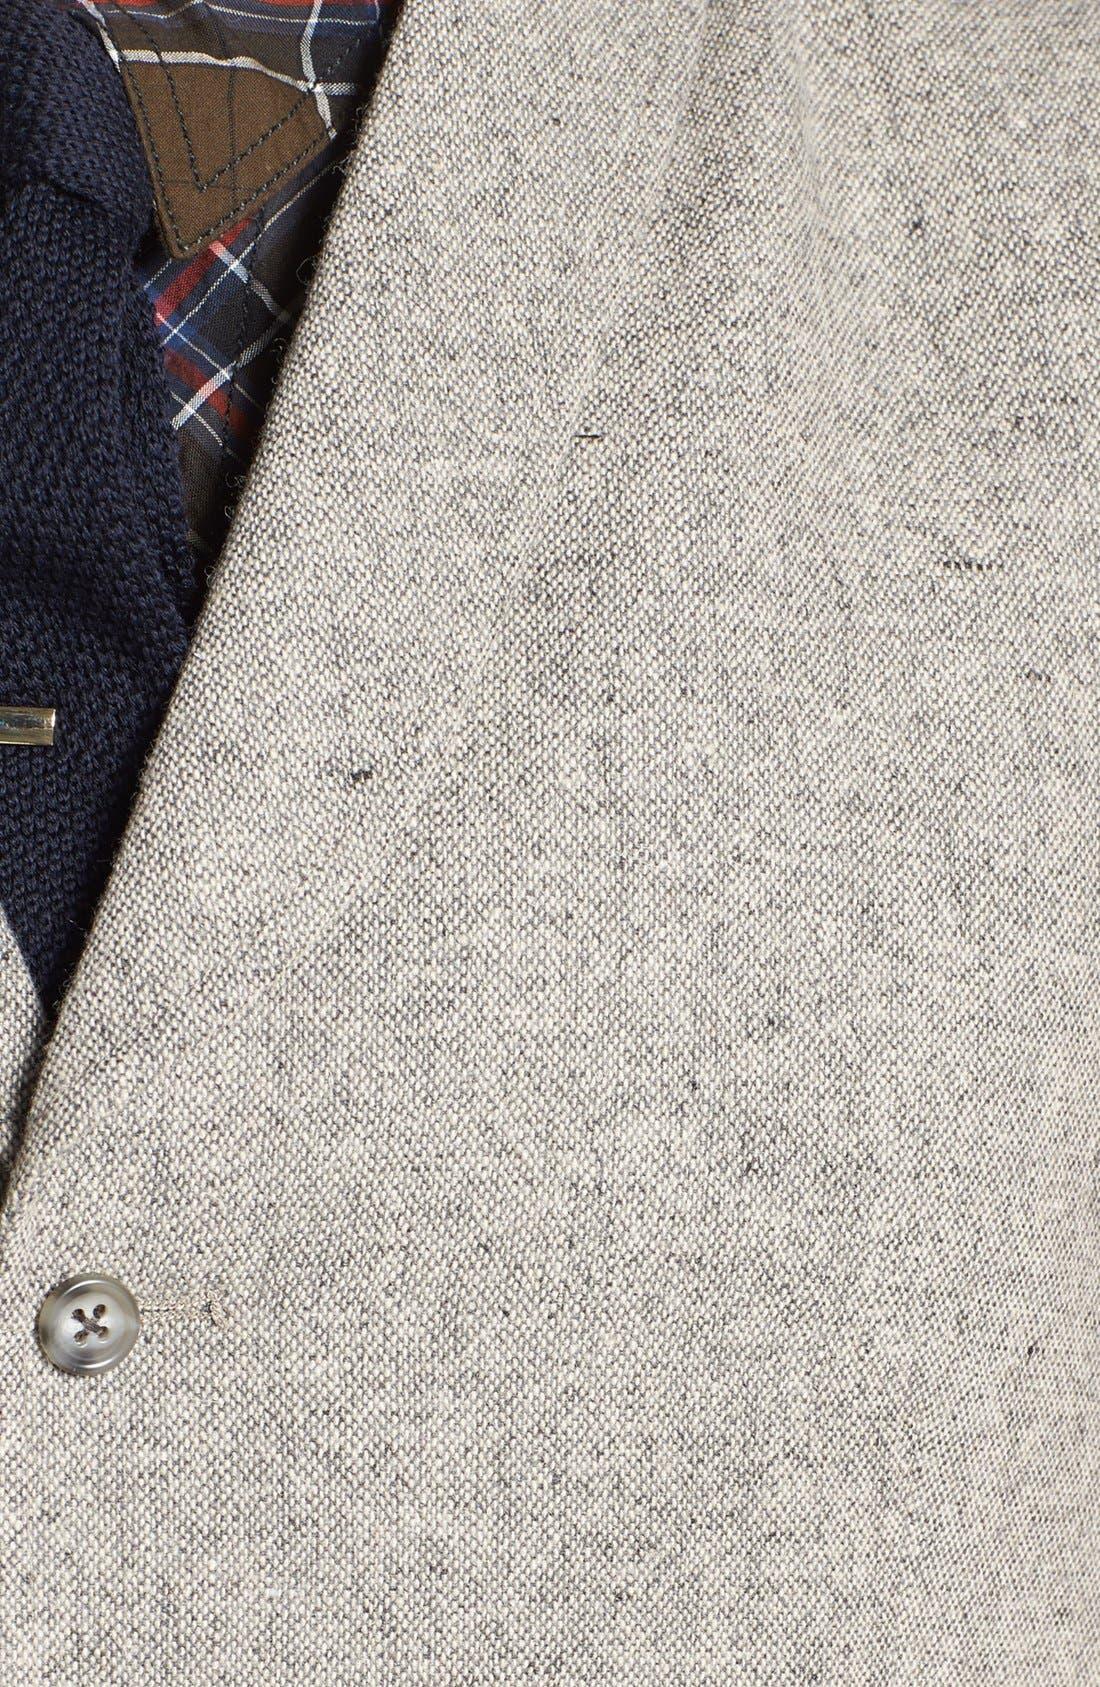 Alternate Image 2  - 1901 Shawl Collar Grey Flannel Vest